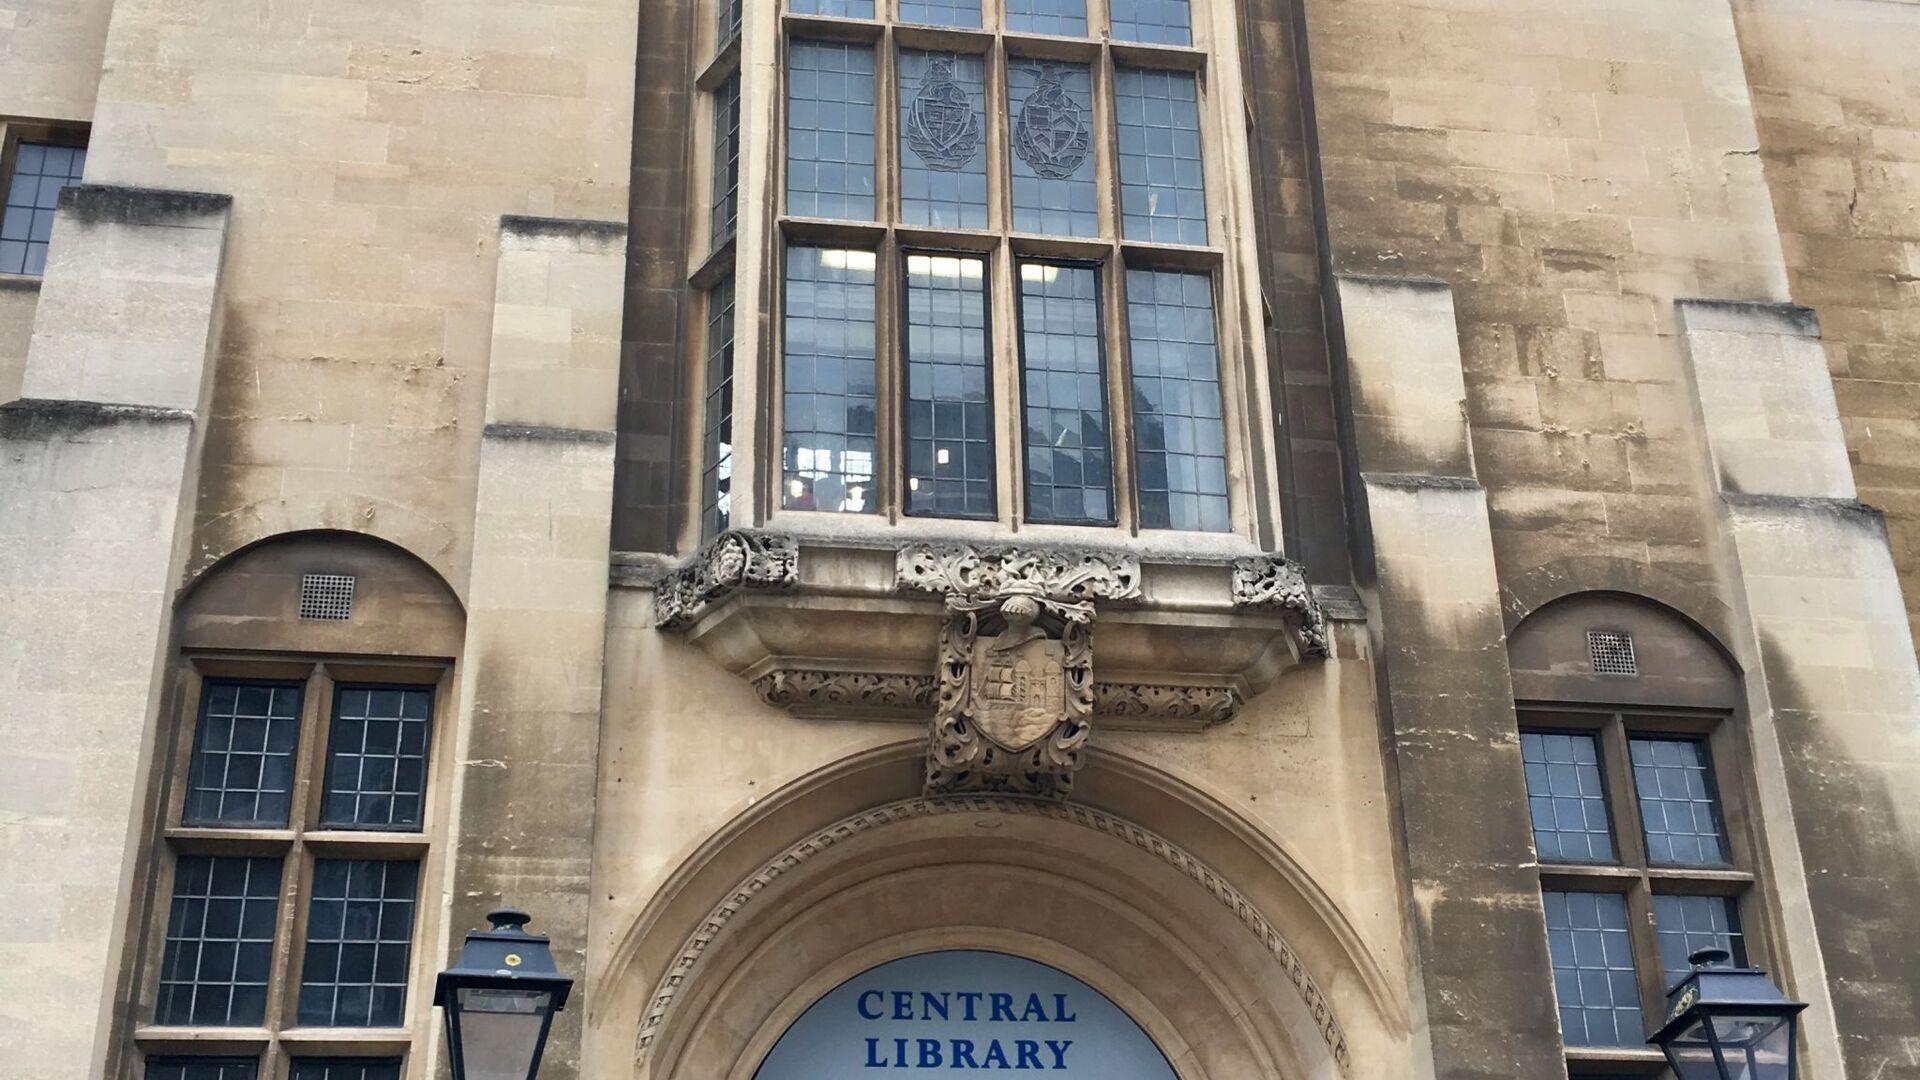 Bristol Central Library. - Sputnik International, 1920, 06.09.2021